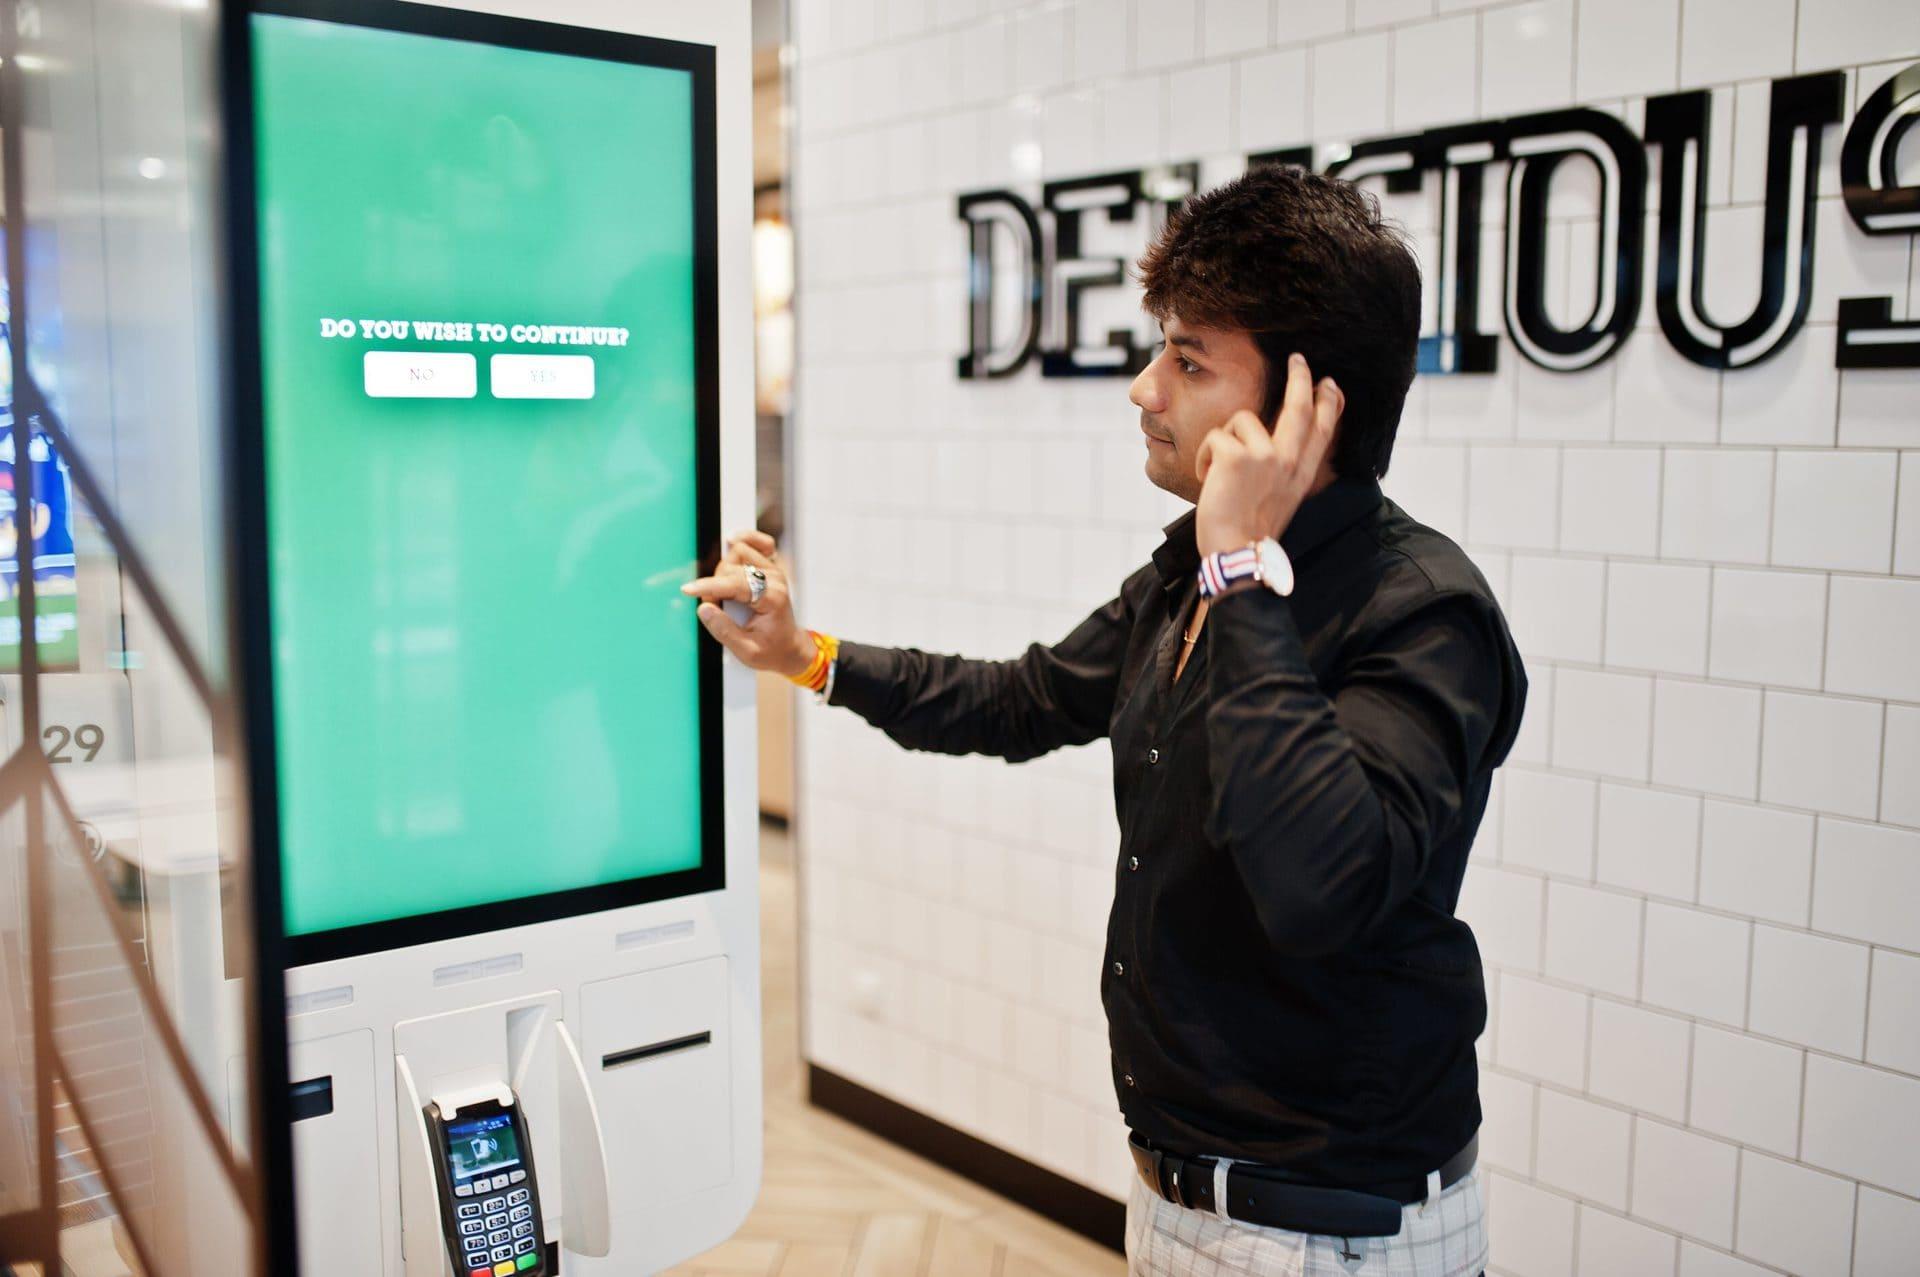 Self-service digital signage kiosk